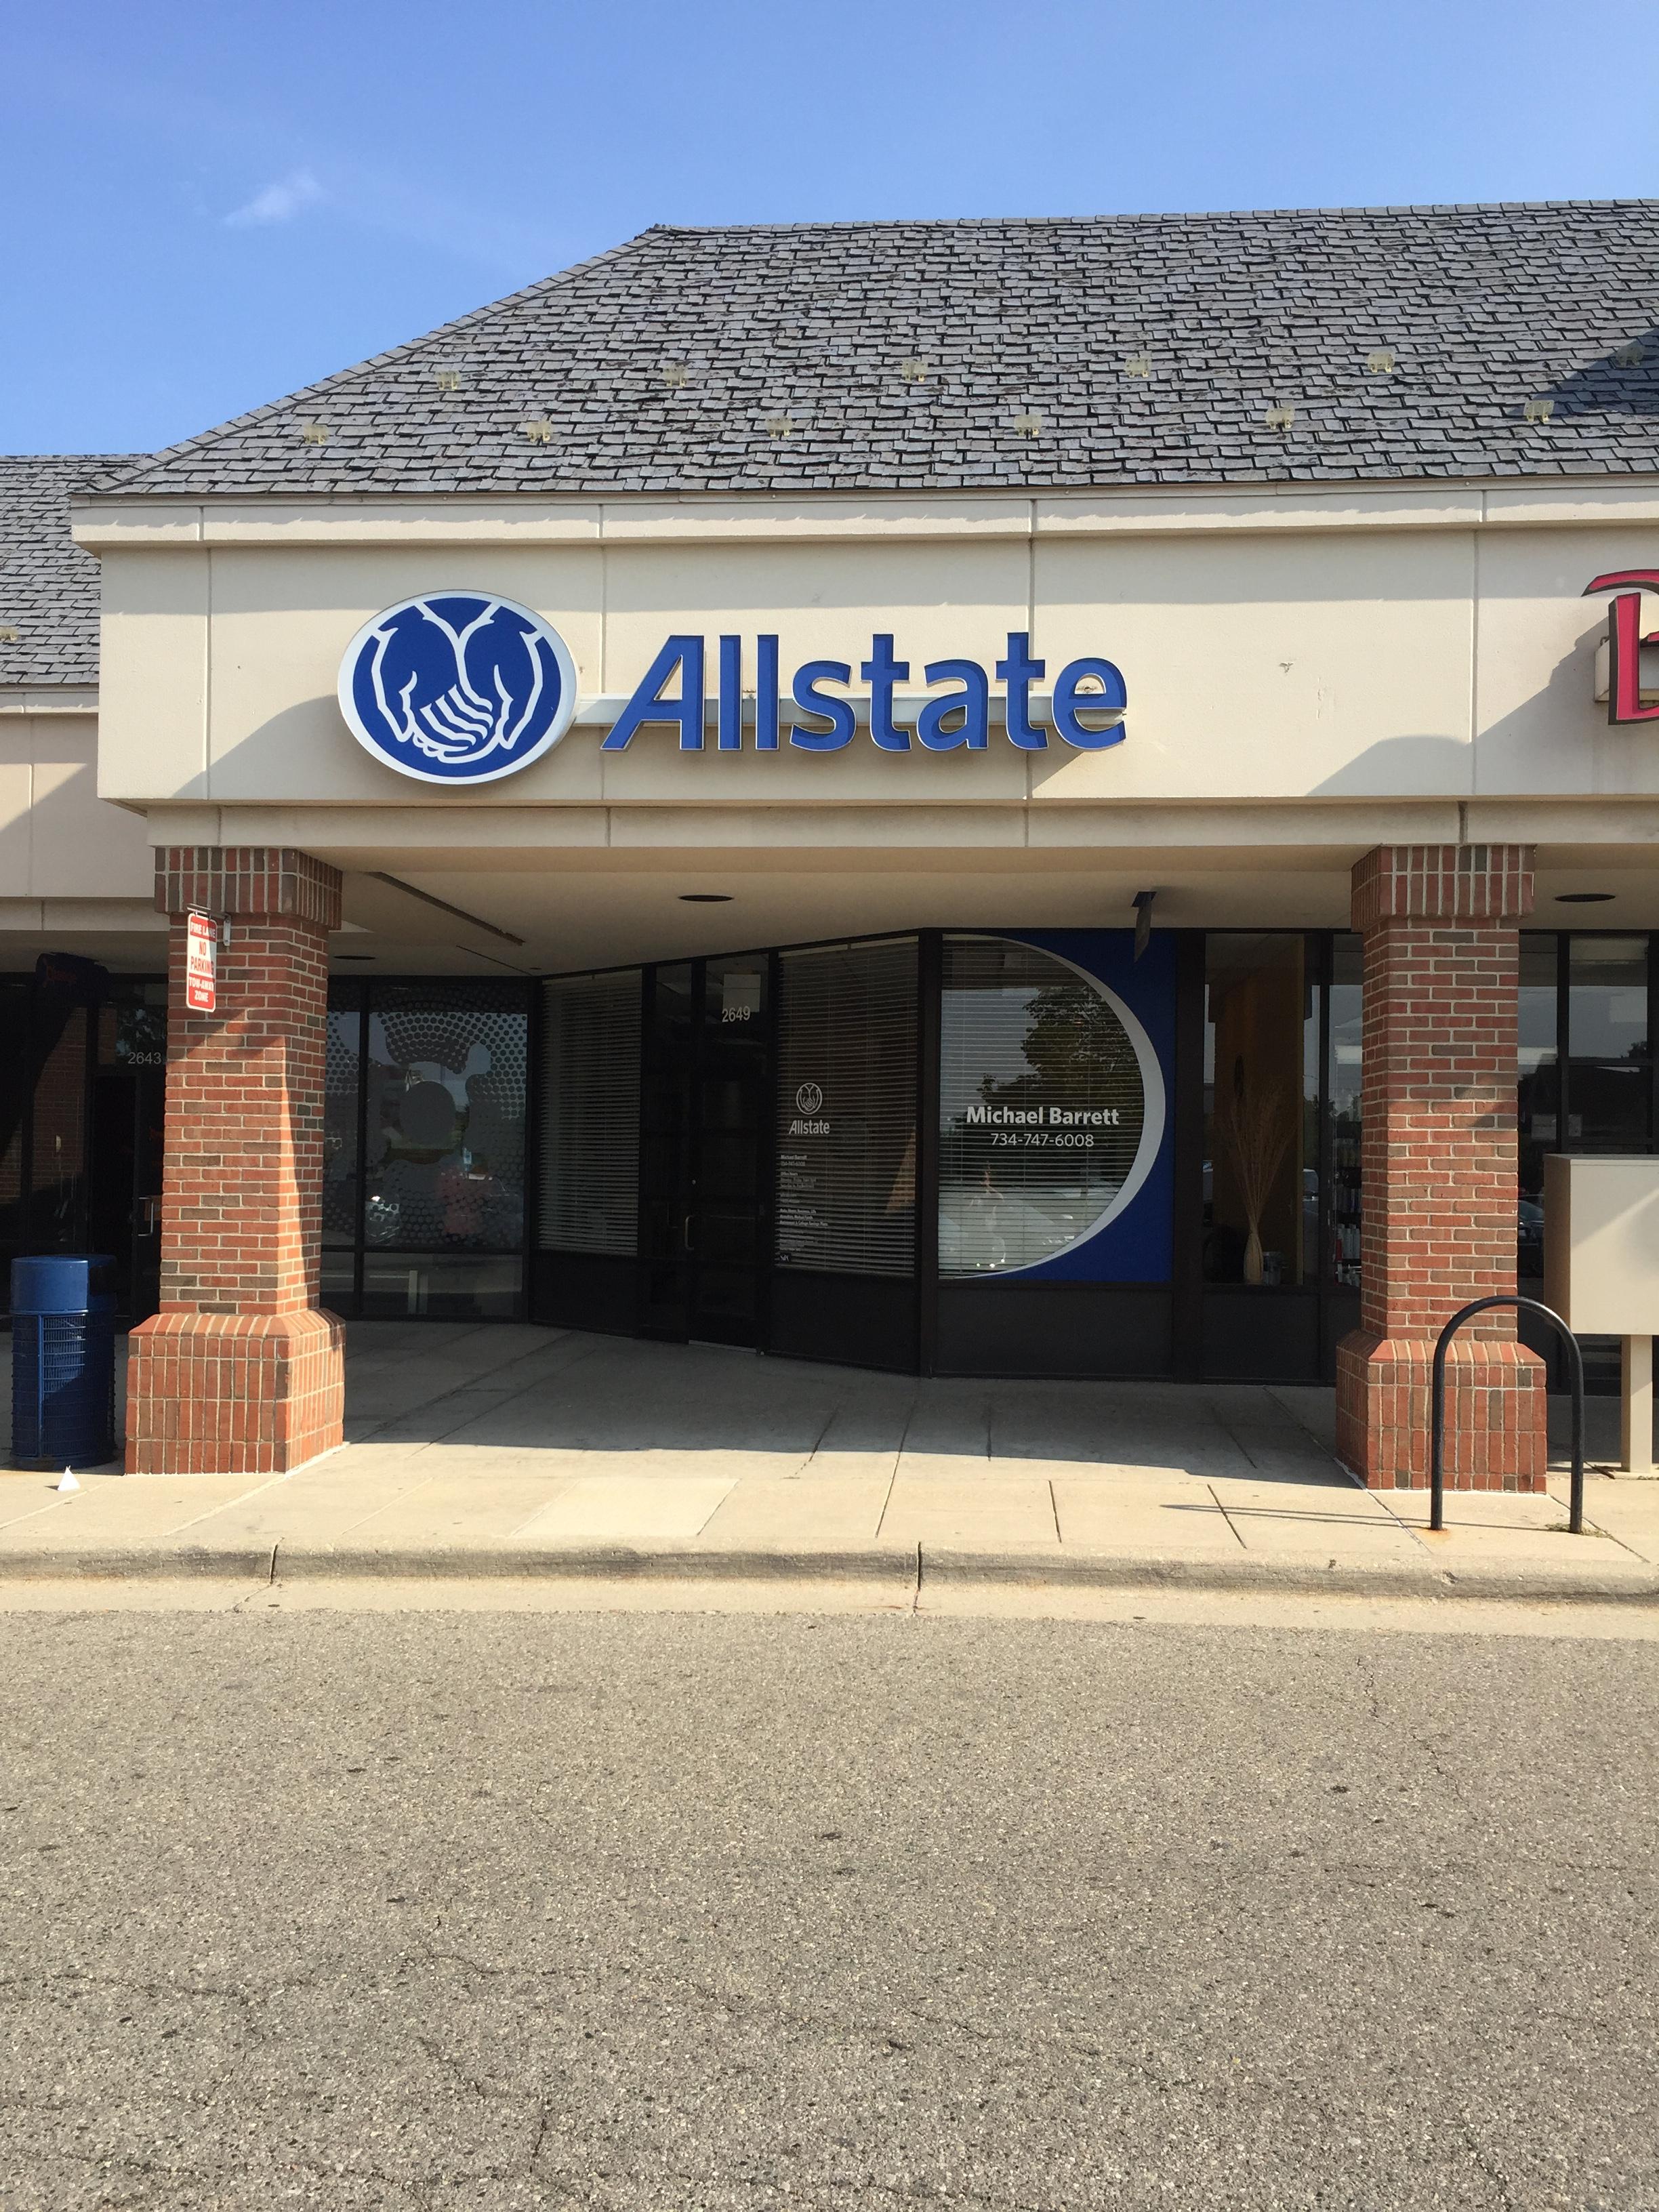 Michael Barrett: Allstate Insurance image 2